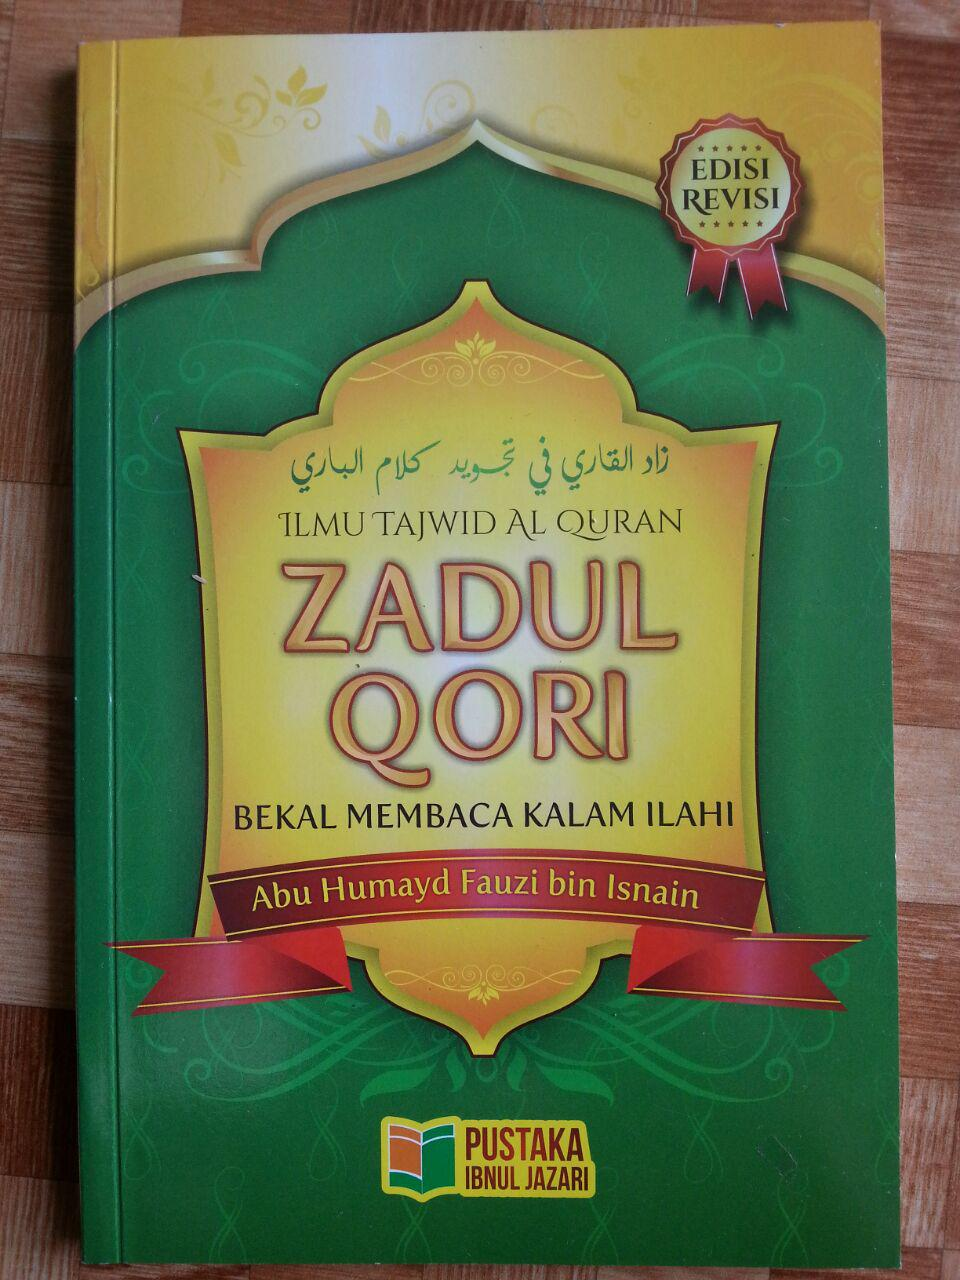 Buku Zadul Qori Bekal Membaca Kalam Ilahi cover 2